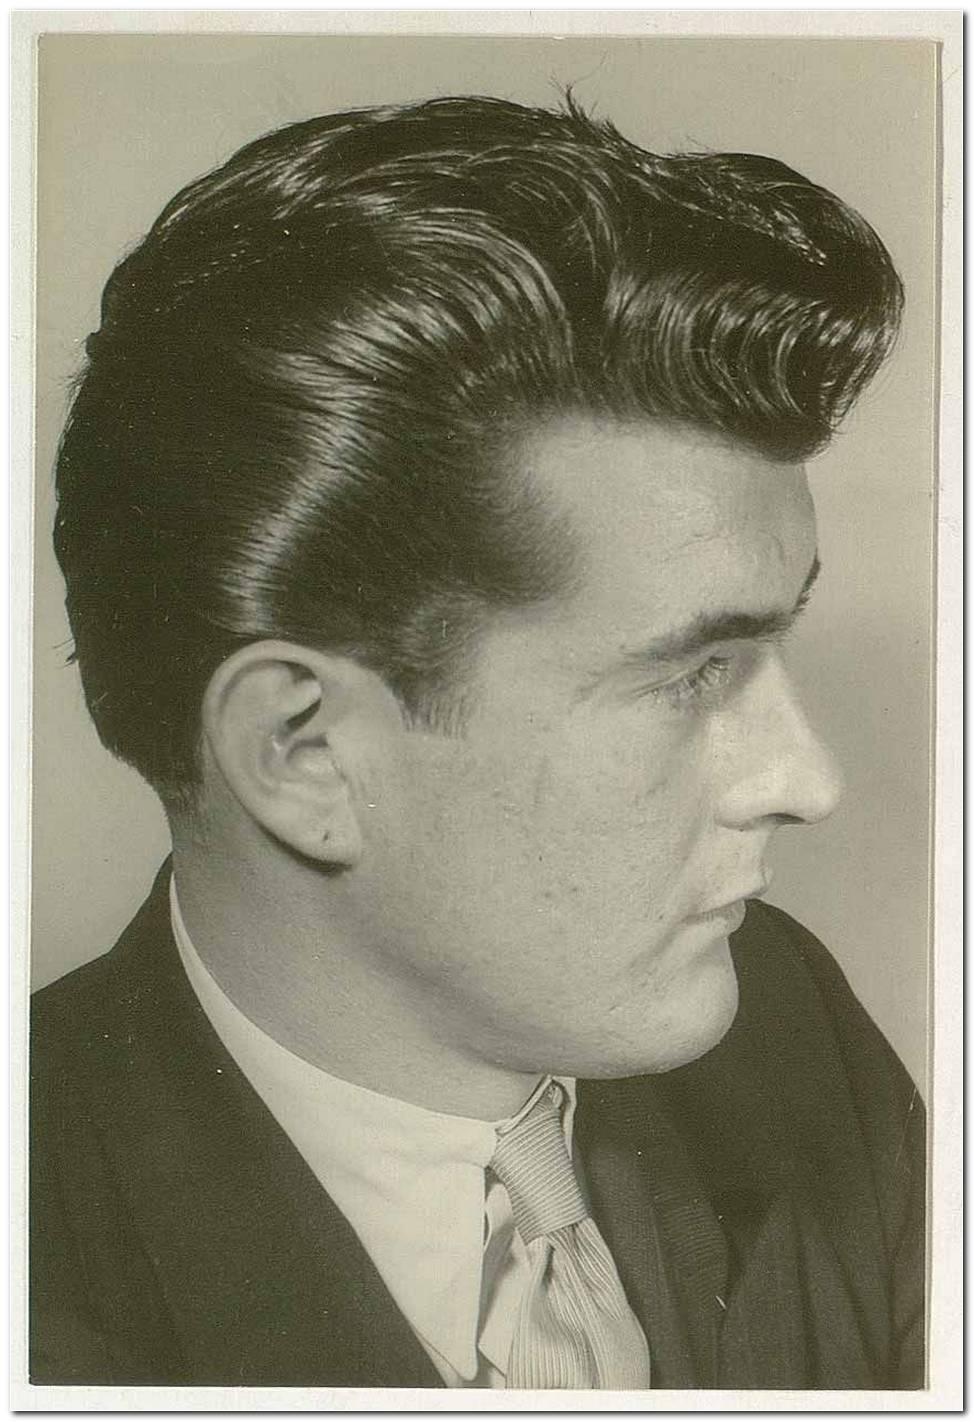 Herren Frisuren Der 50er